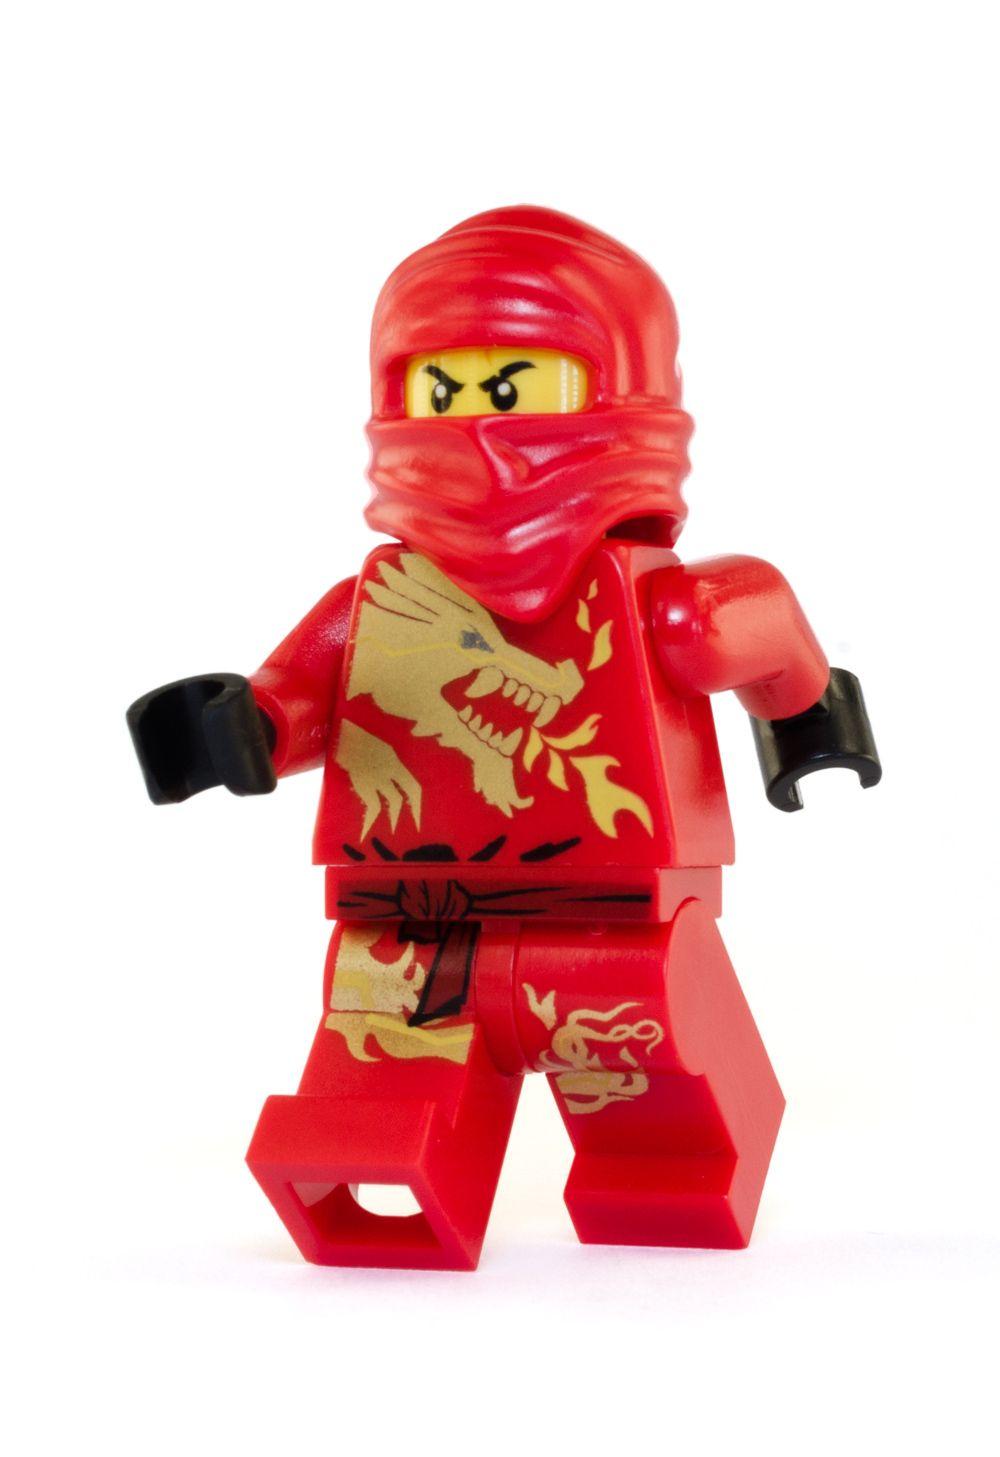 lego ninjago kai google search my little guy 39 s favorite things pinterest ninjago kai. Black Bedroom Furniture Sets. Home Design Ideas